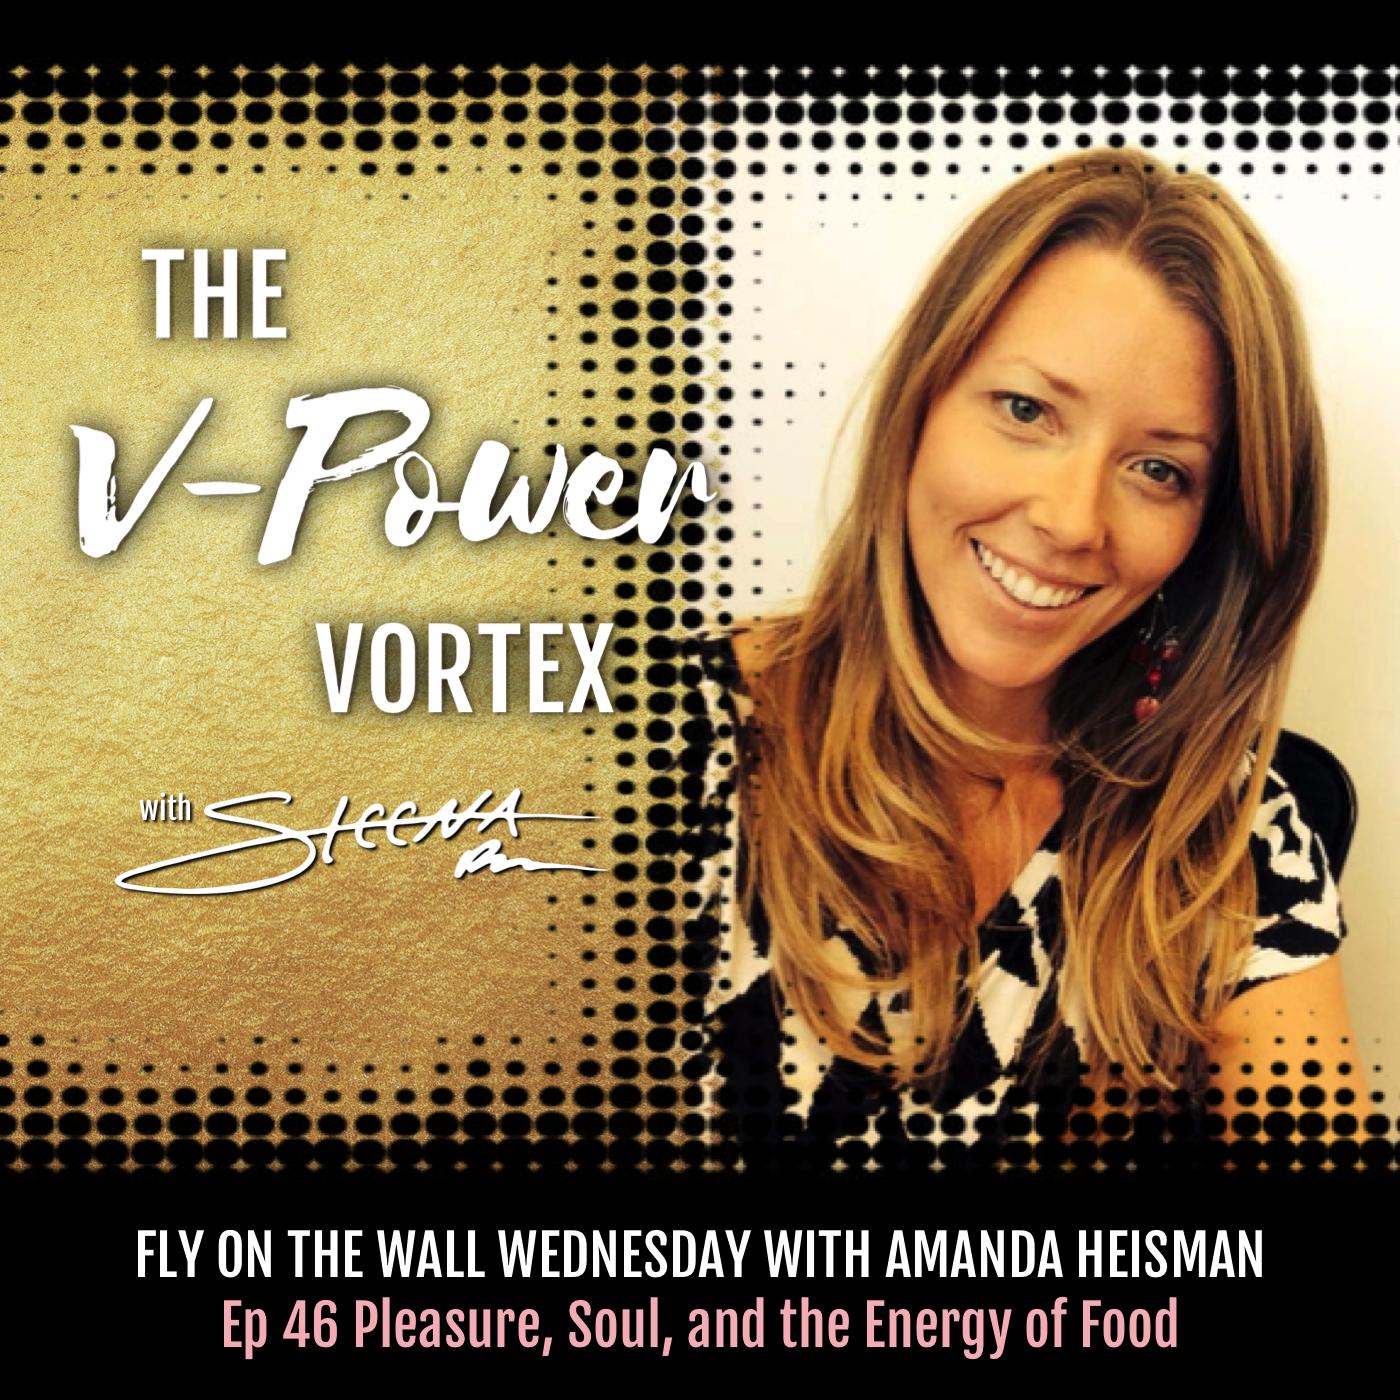 Ep 46 Pleasure, Soul, and the Energy of Food - Fly on the Wall Wednesday with Amanda Heisman.jpeg